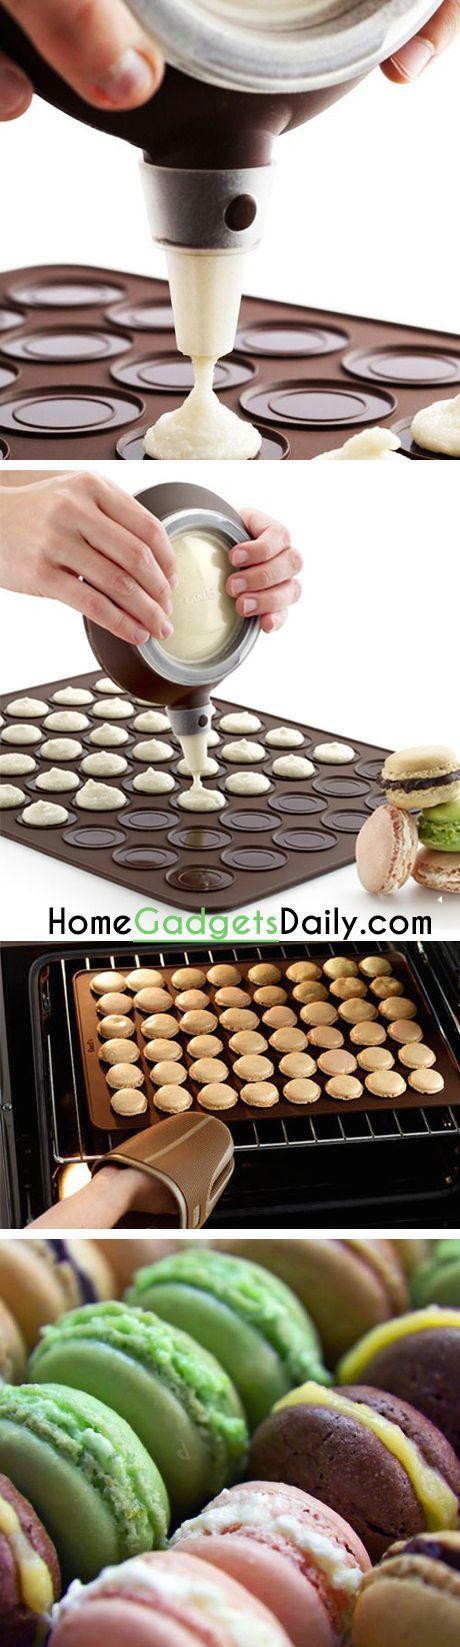 Fall in Love with Lekue Macaron Kit. #baking #macaron #gadgets